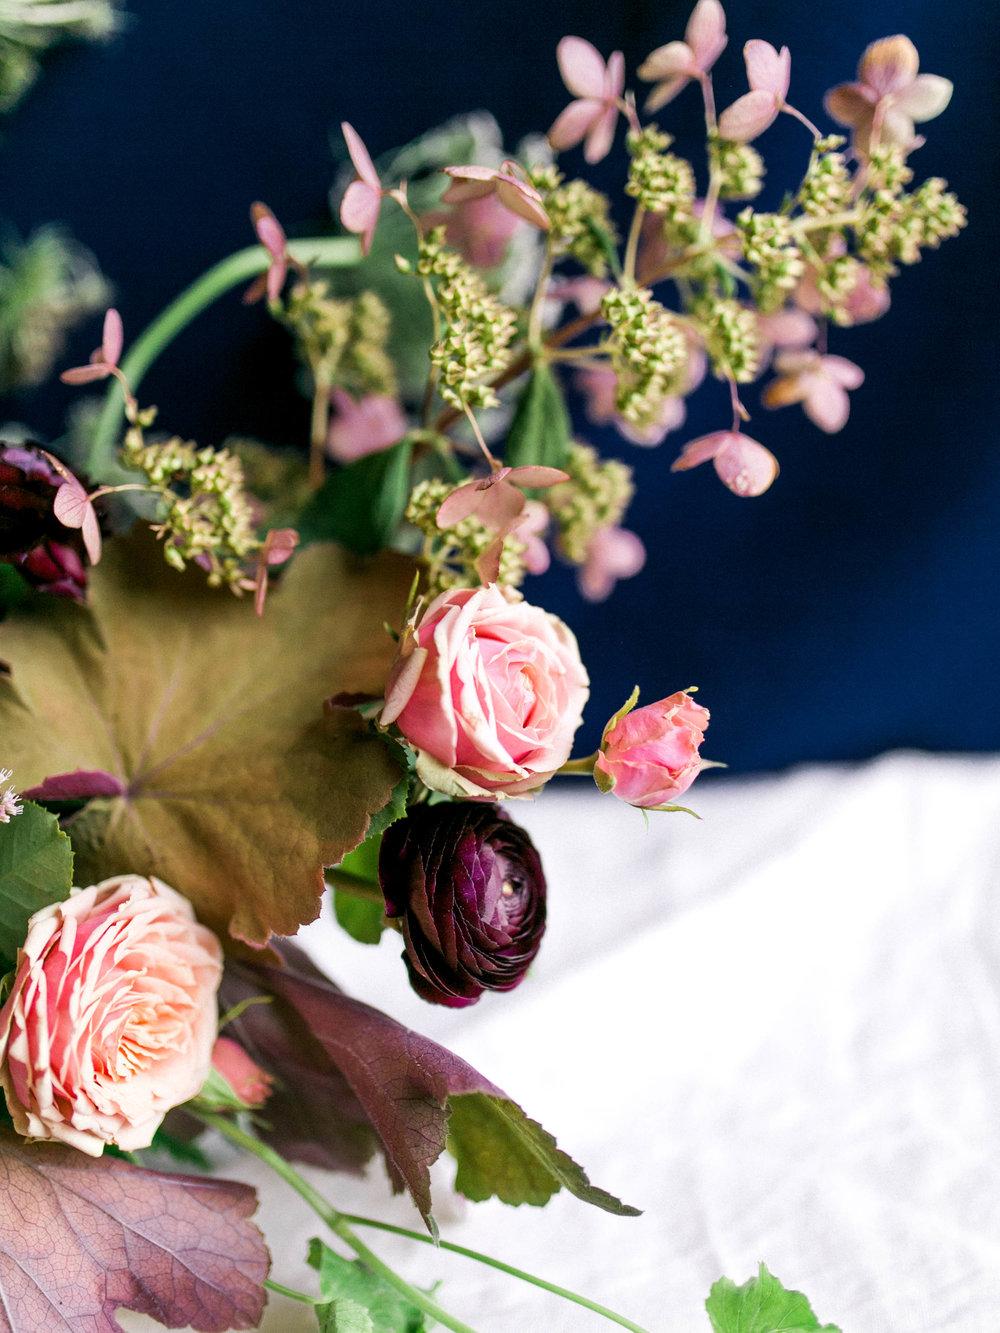 Floral wedding centerpiece | www.chavelli.com